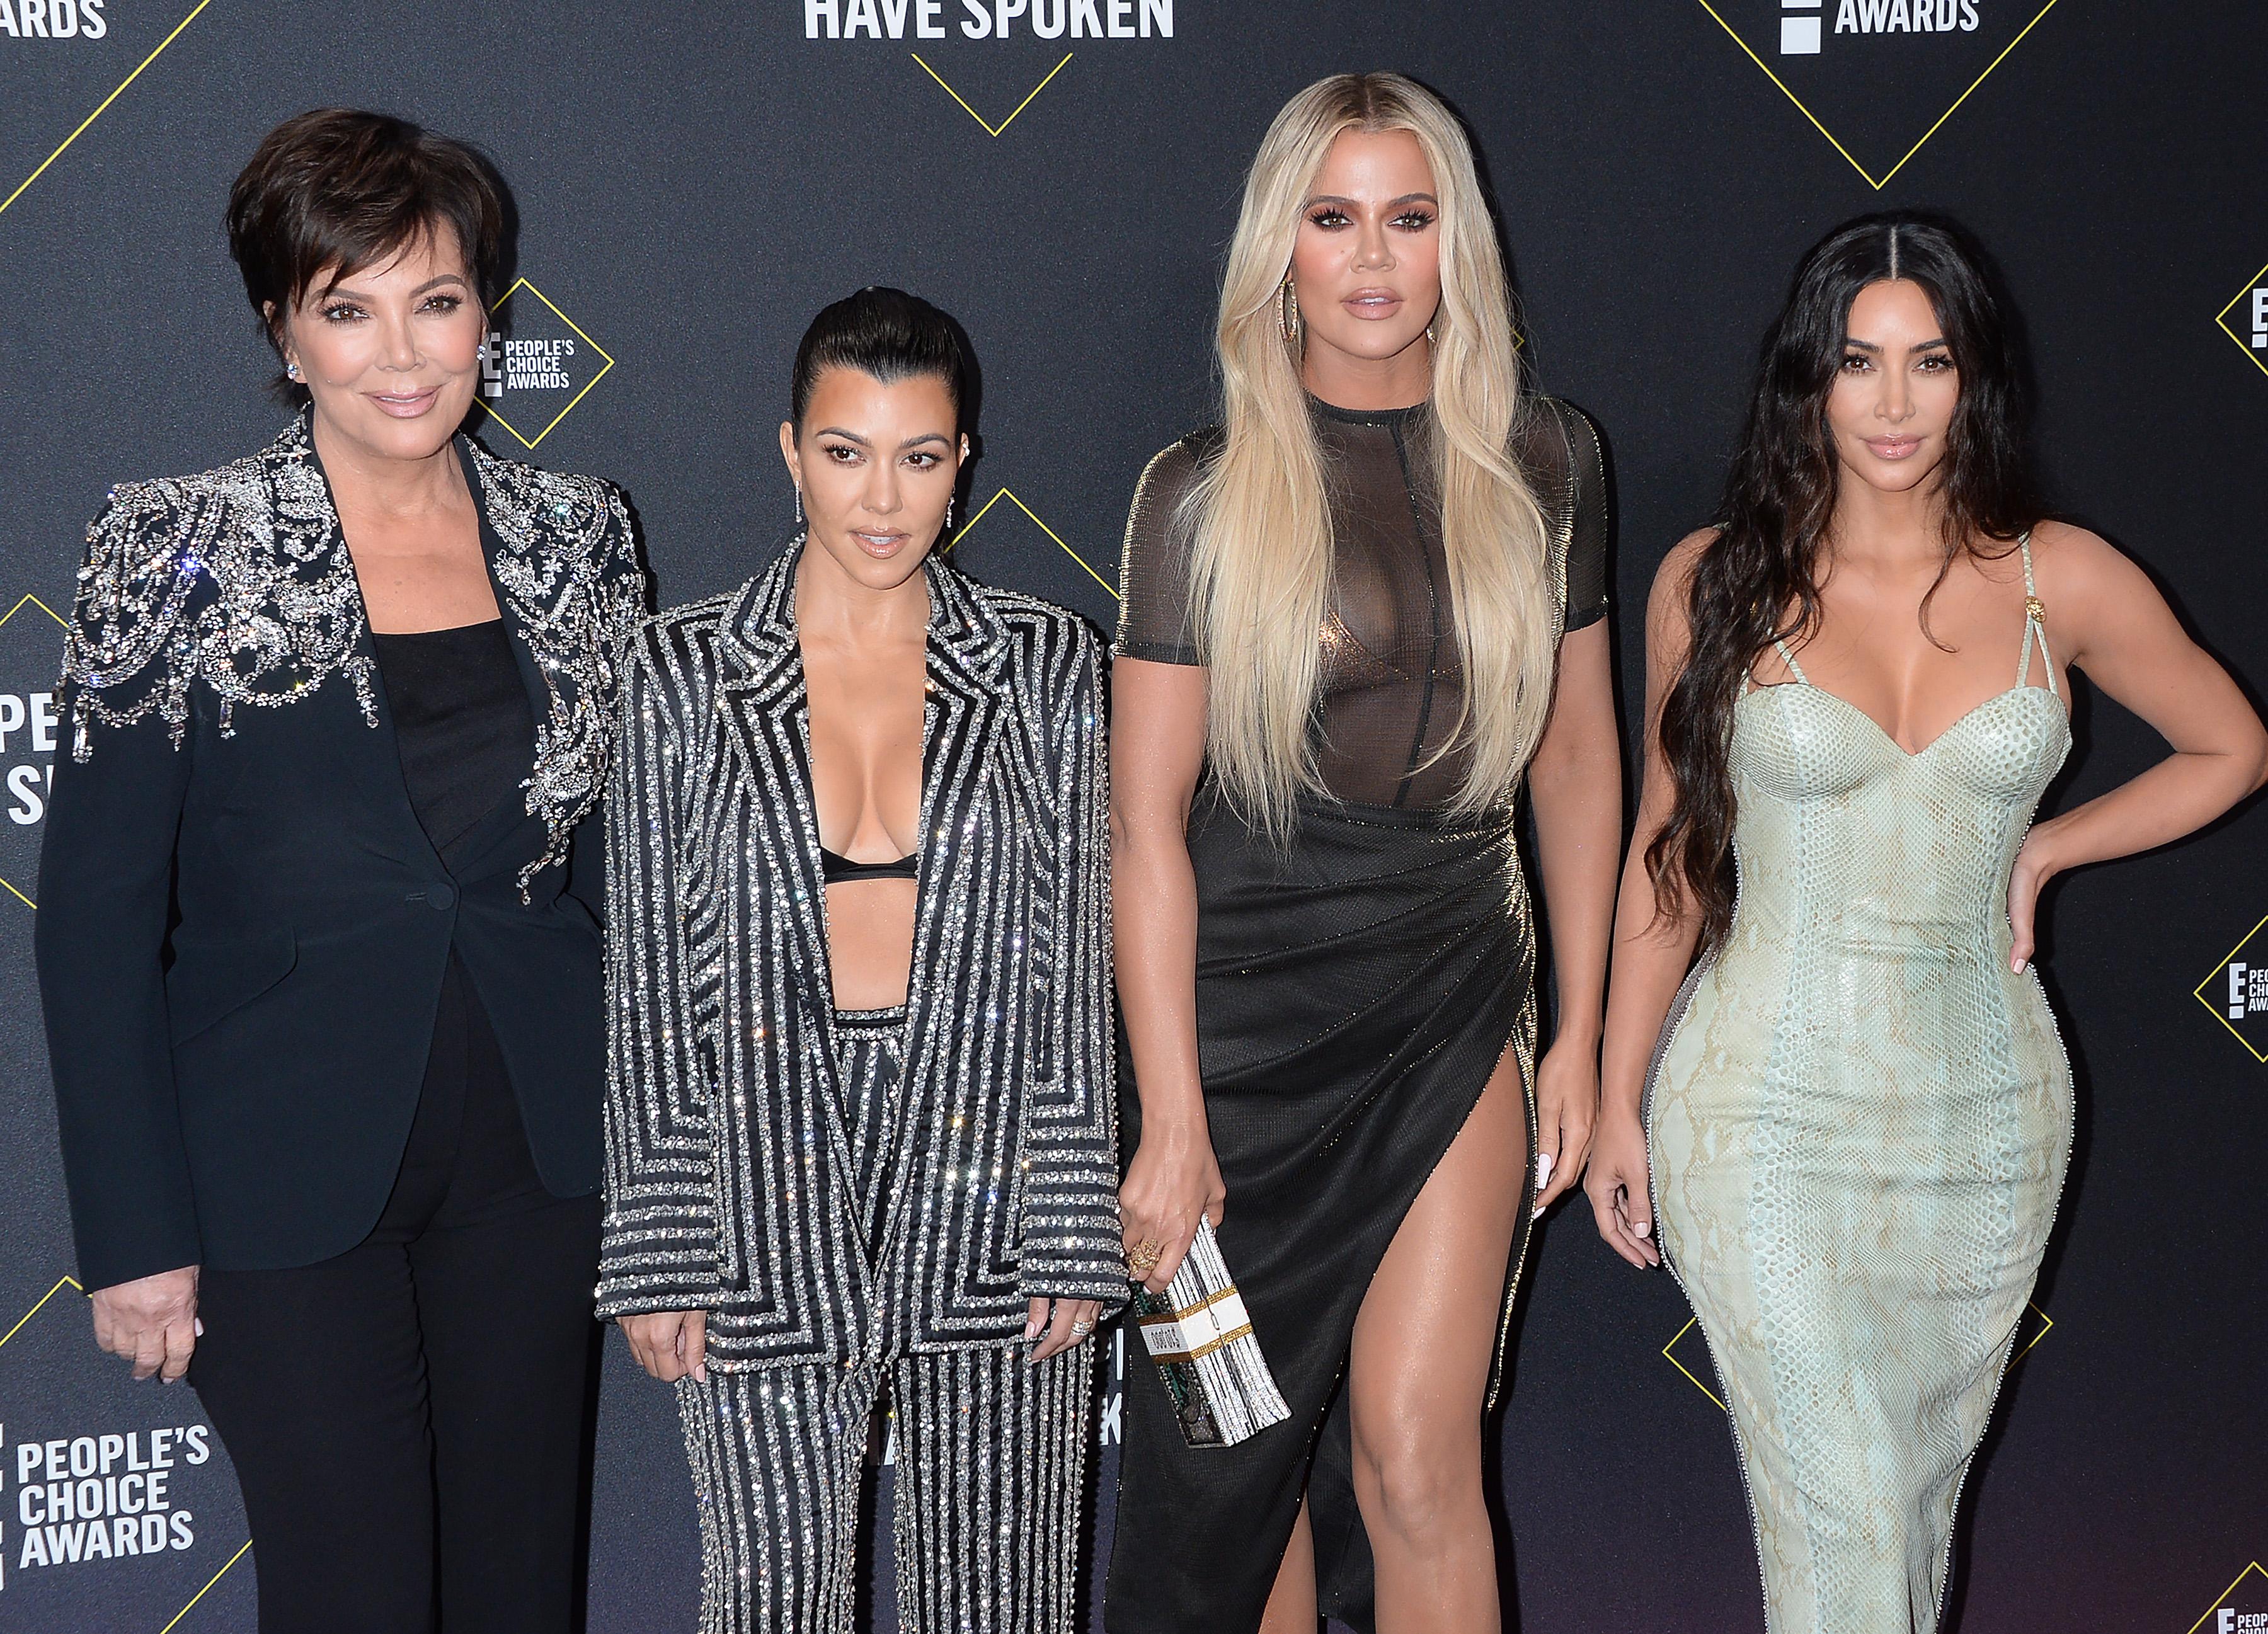 Kris Jenner and daughters Kourtney Kim and Khloe Kardashian